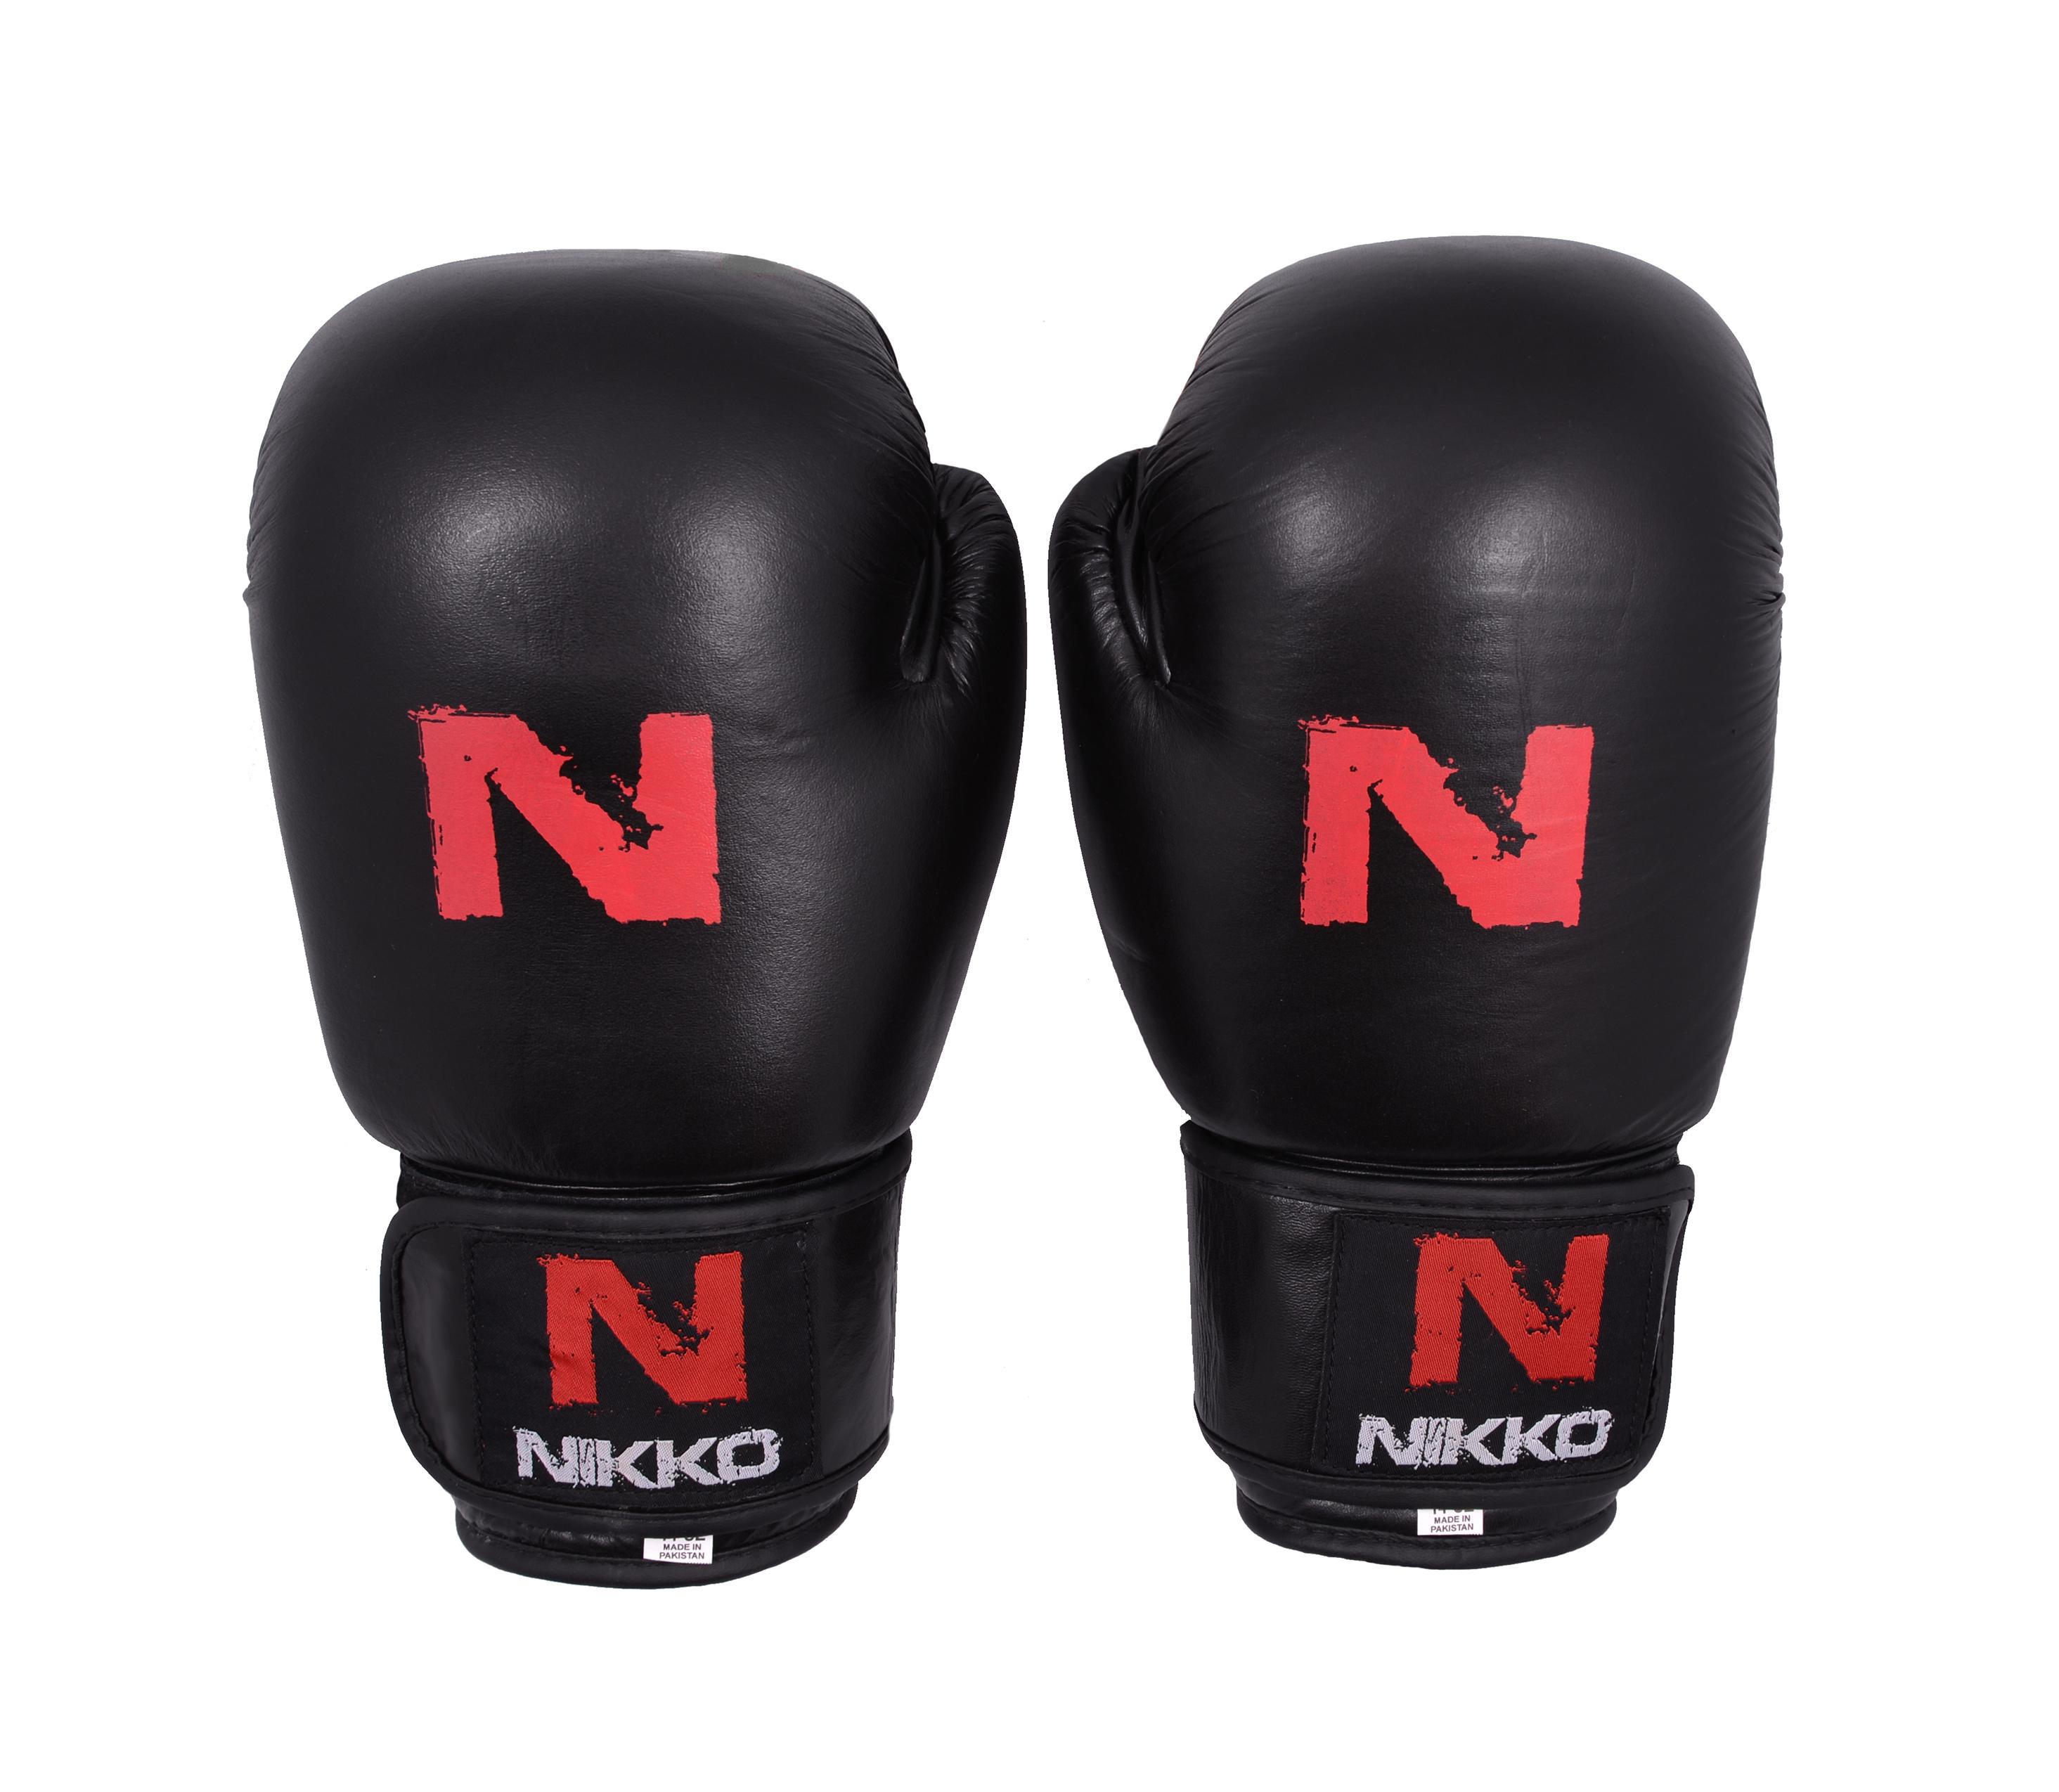 Nikko Bokshandschoenen Basic Kids Zwart